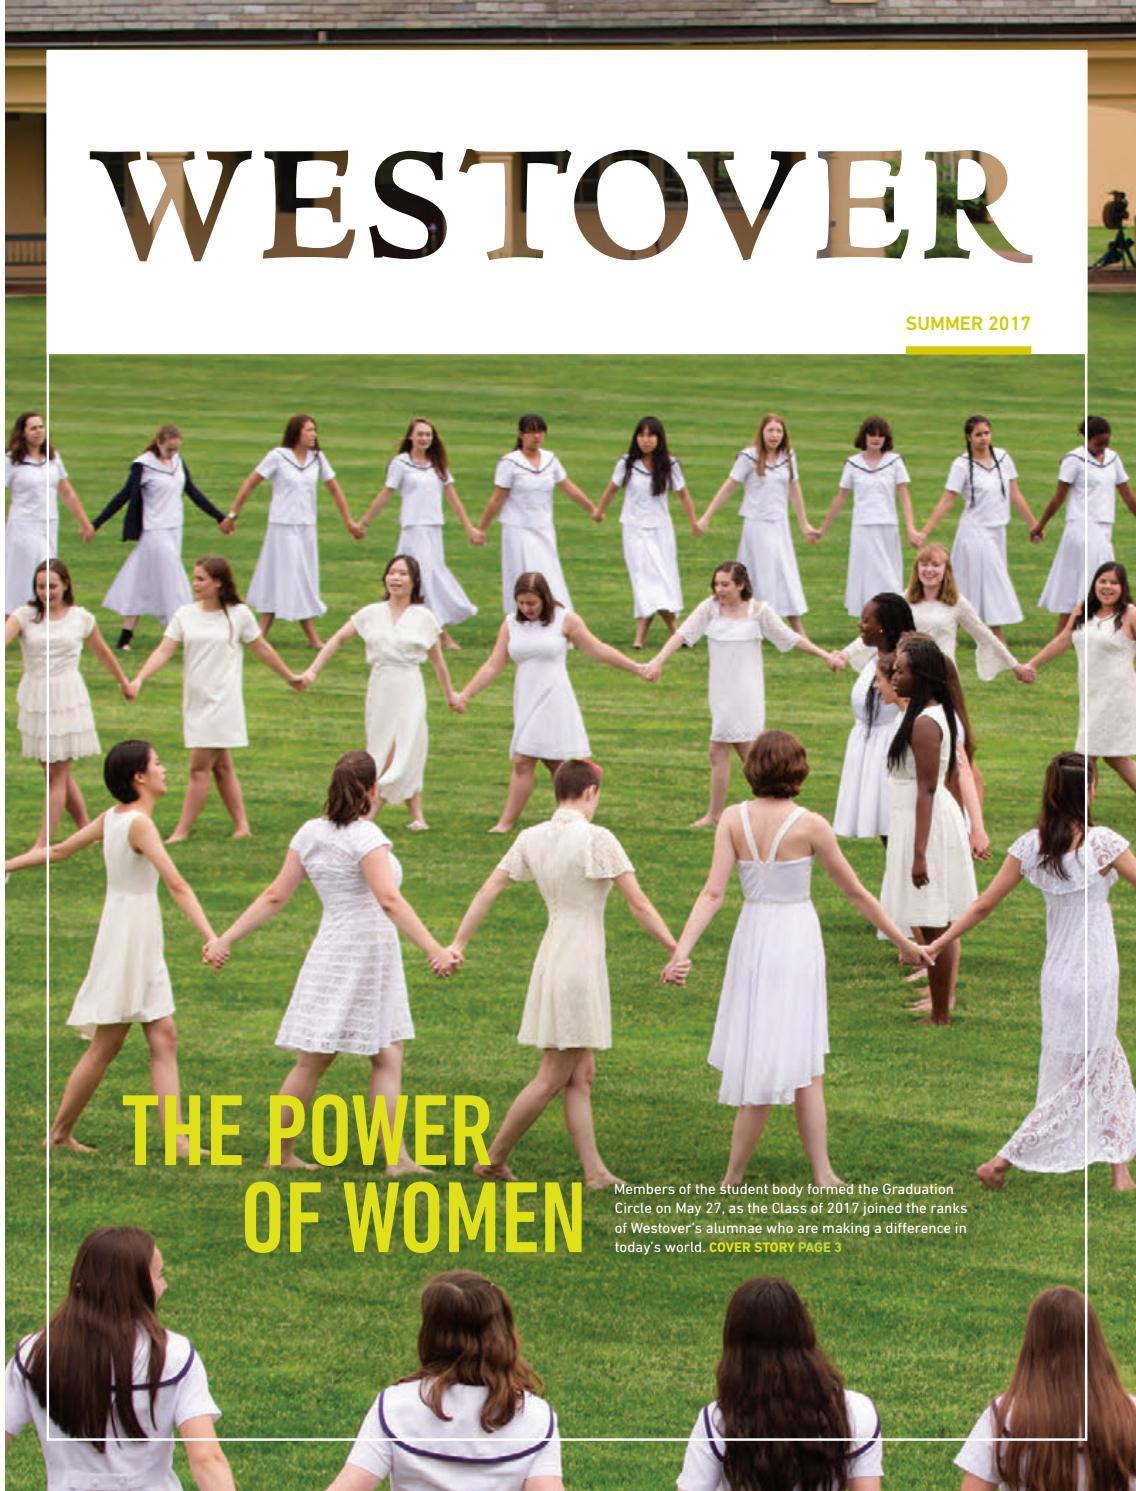 2017 Westover Summer Magazine by Westover School issuu